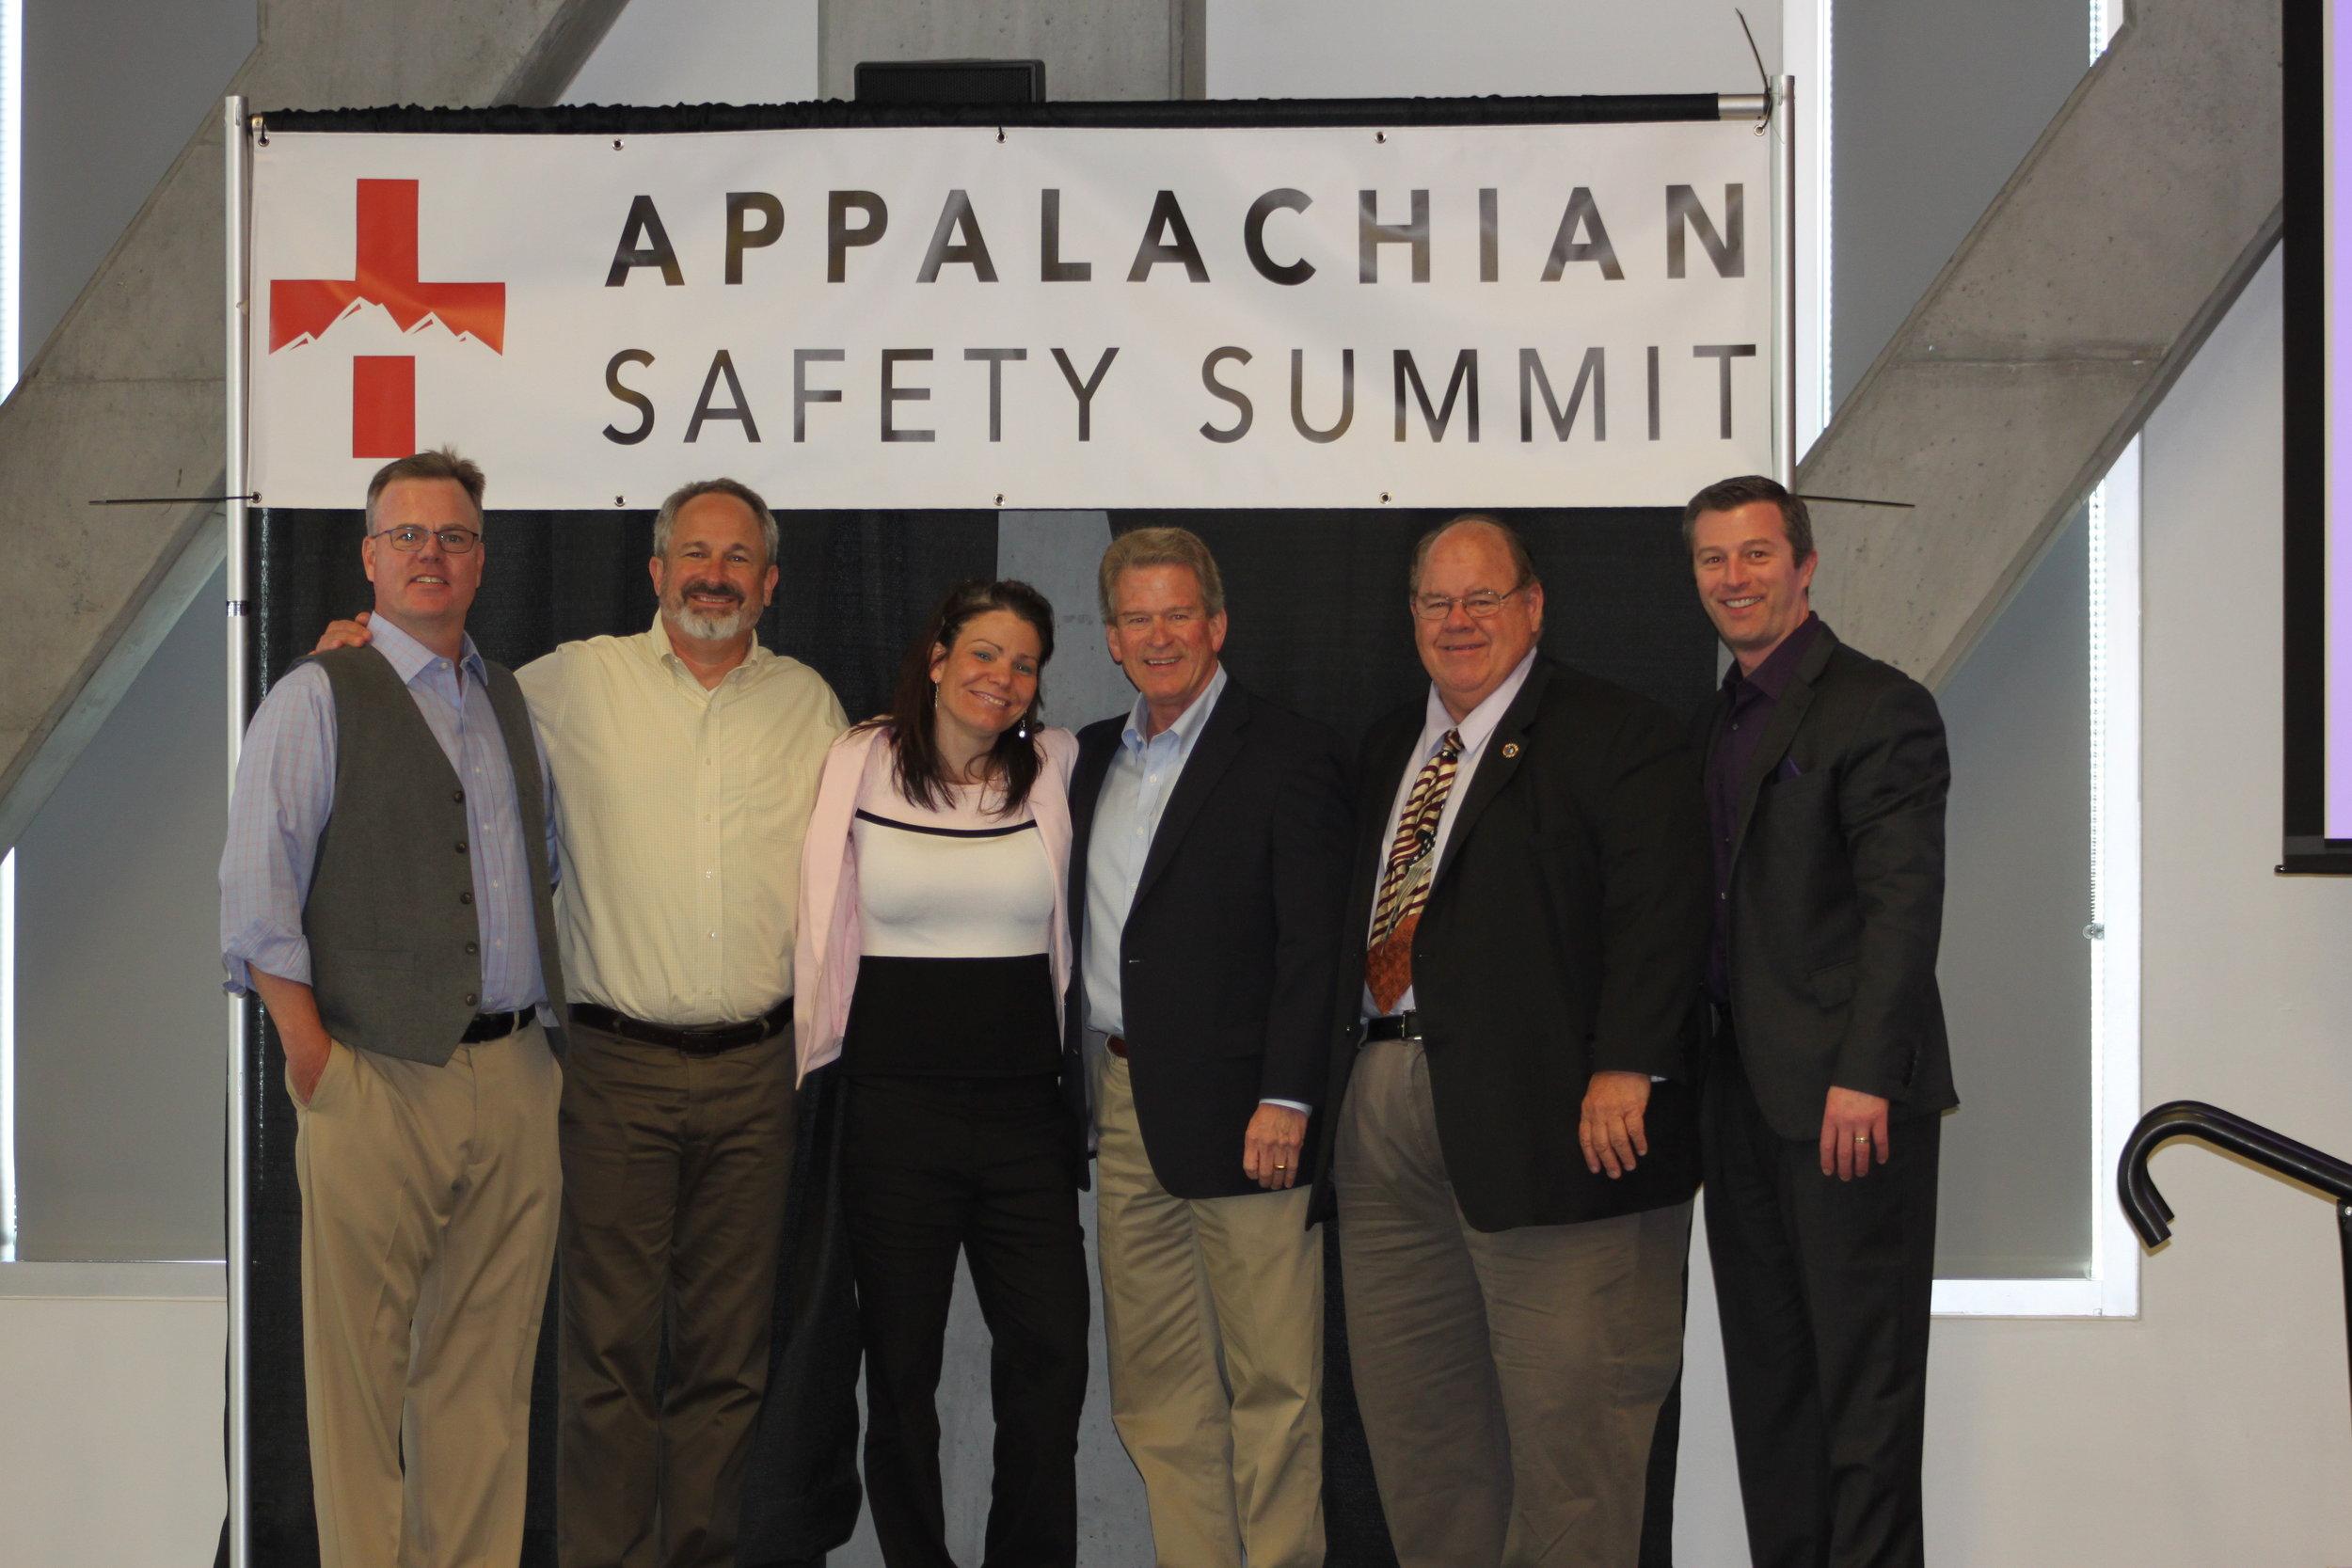 From left to right: Dr. Josh WIlliams, Dr. Timothy Ludwig, Dr. Krista S. Geller, Richard Pollock, John Drebinger and Dr. Shawn Bergman